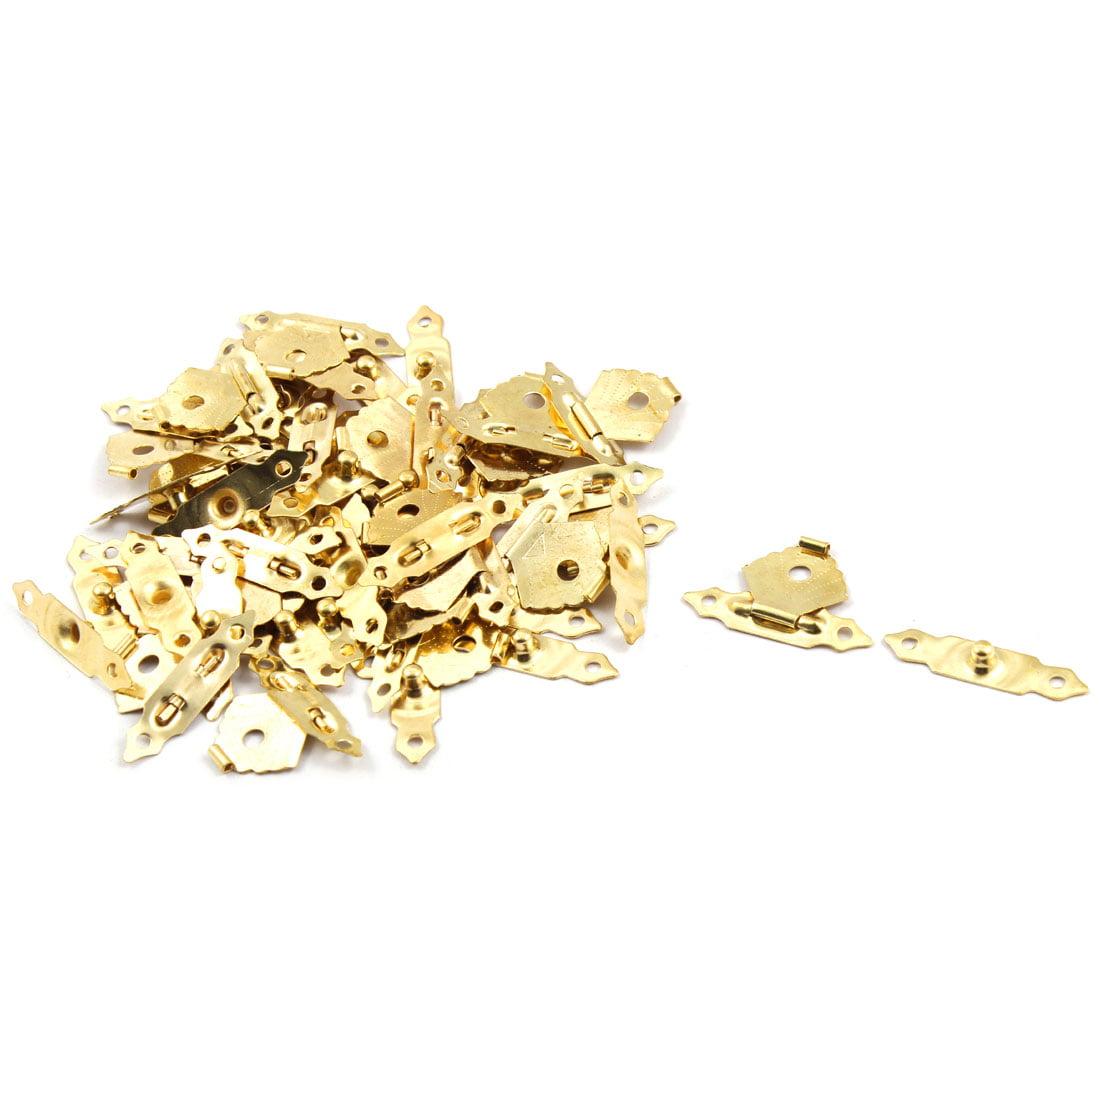 Wood Jewelry Vintage Box Latch Case Hasp Pad Lock Hook Hinge Gold Tone 25 Sets